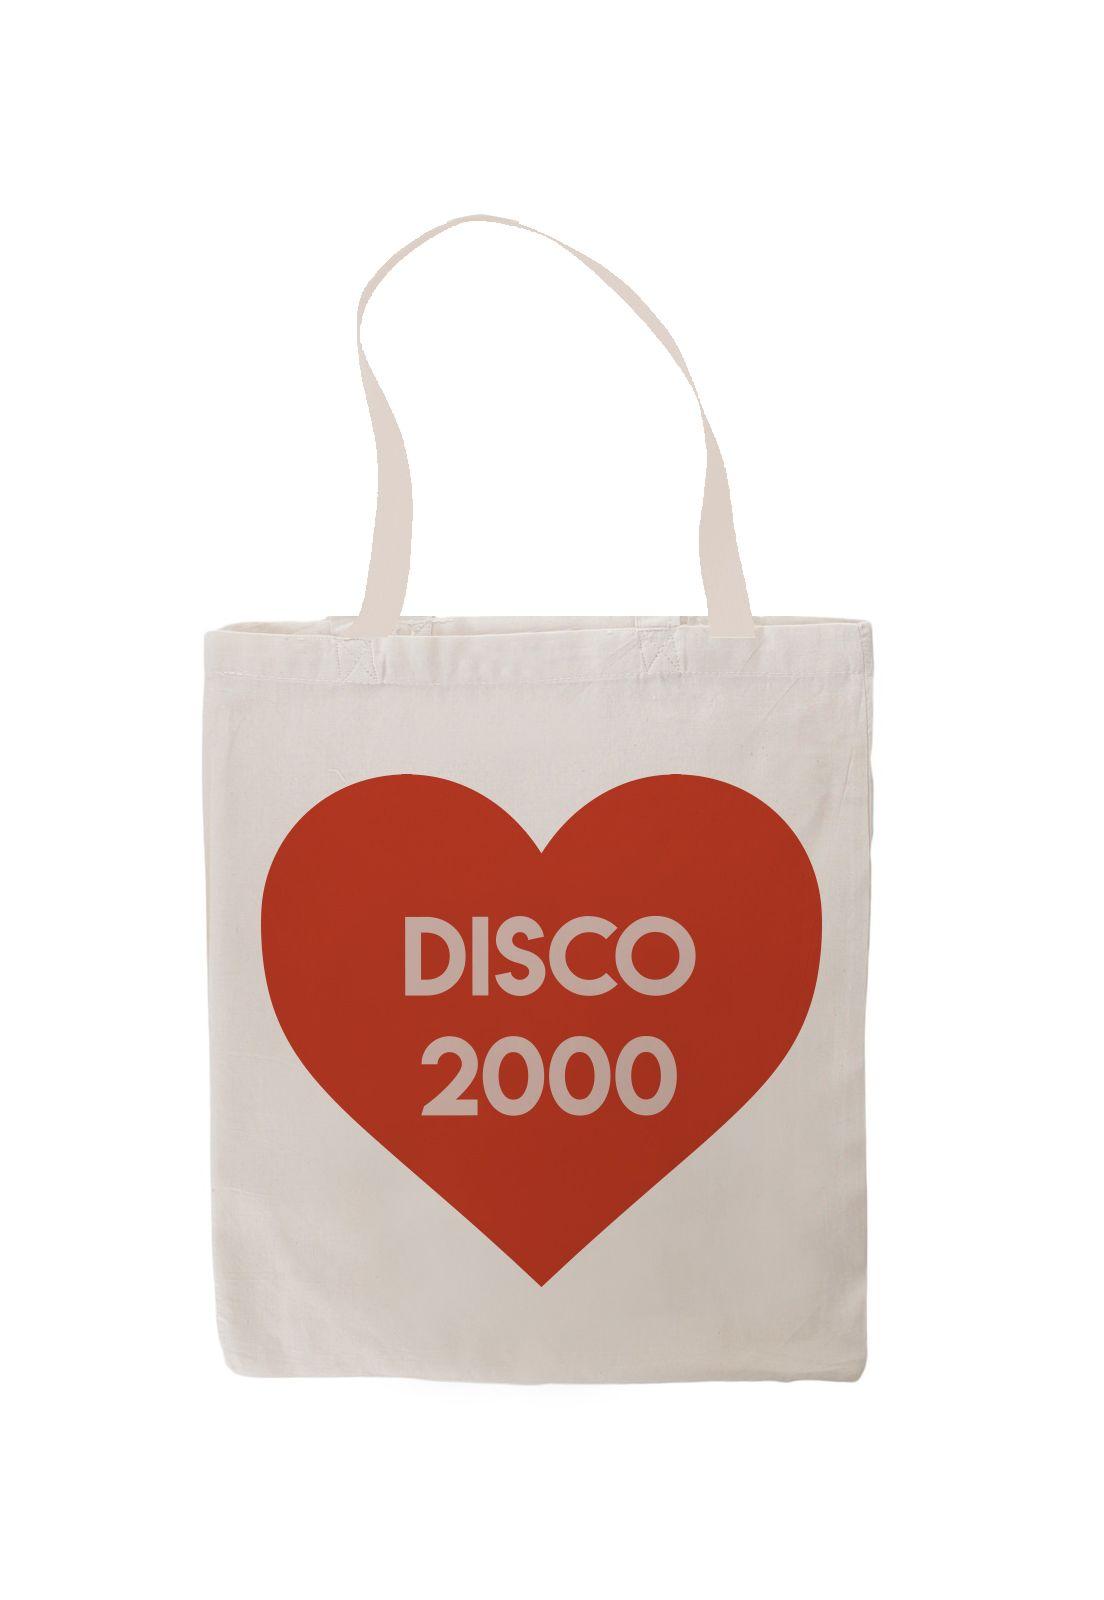 Totebag Disco 2000 PULP